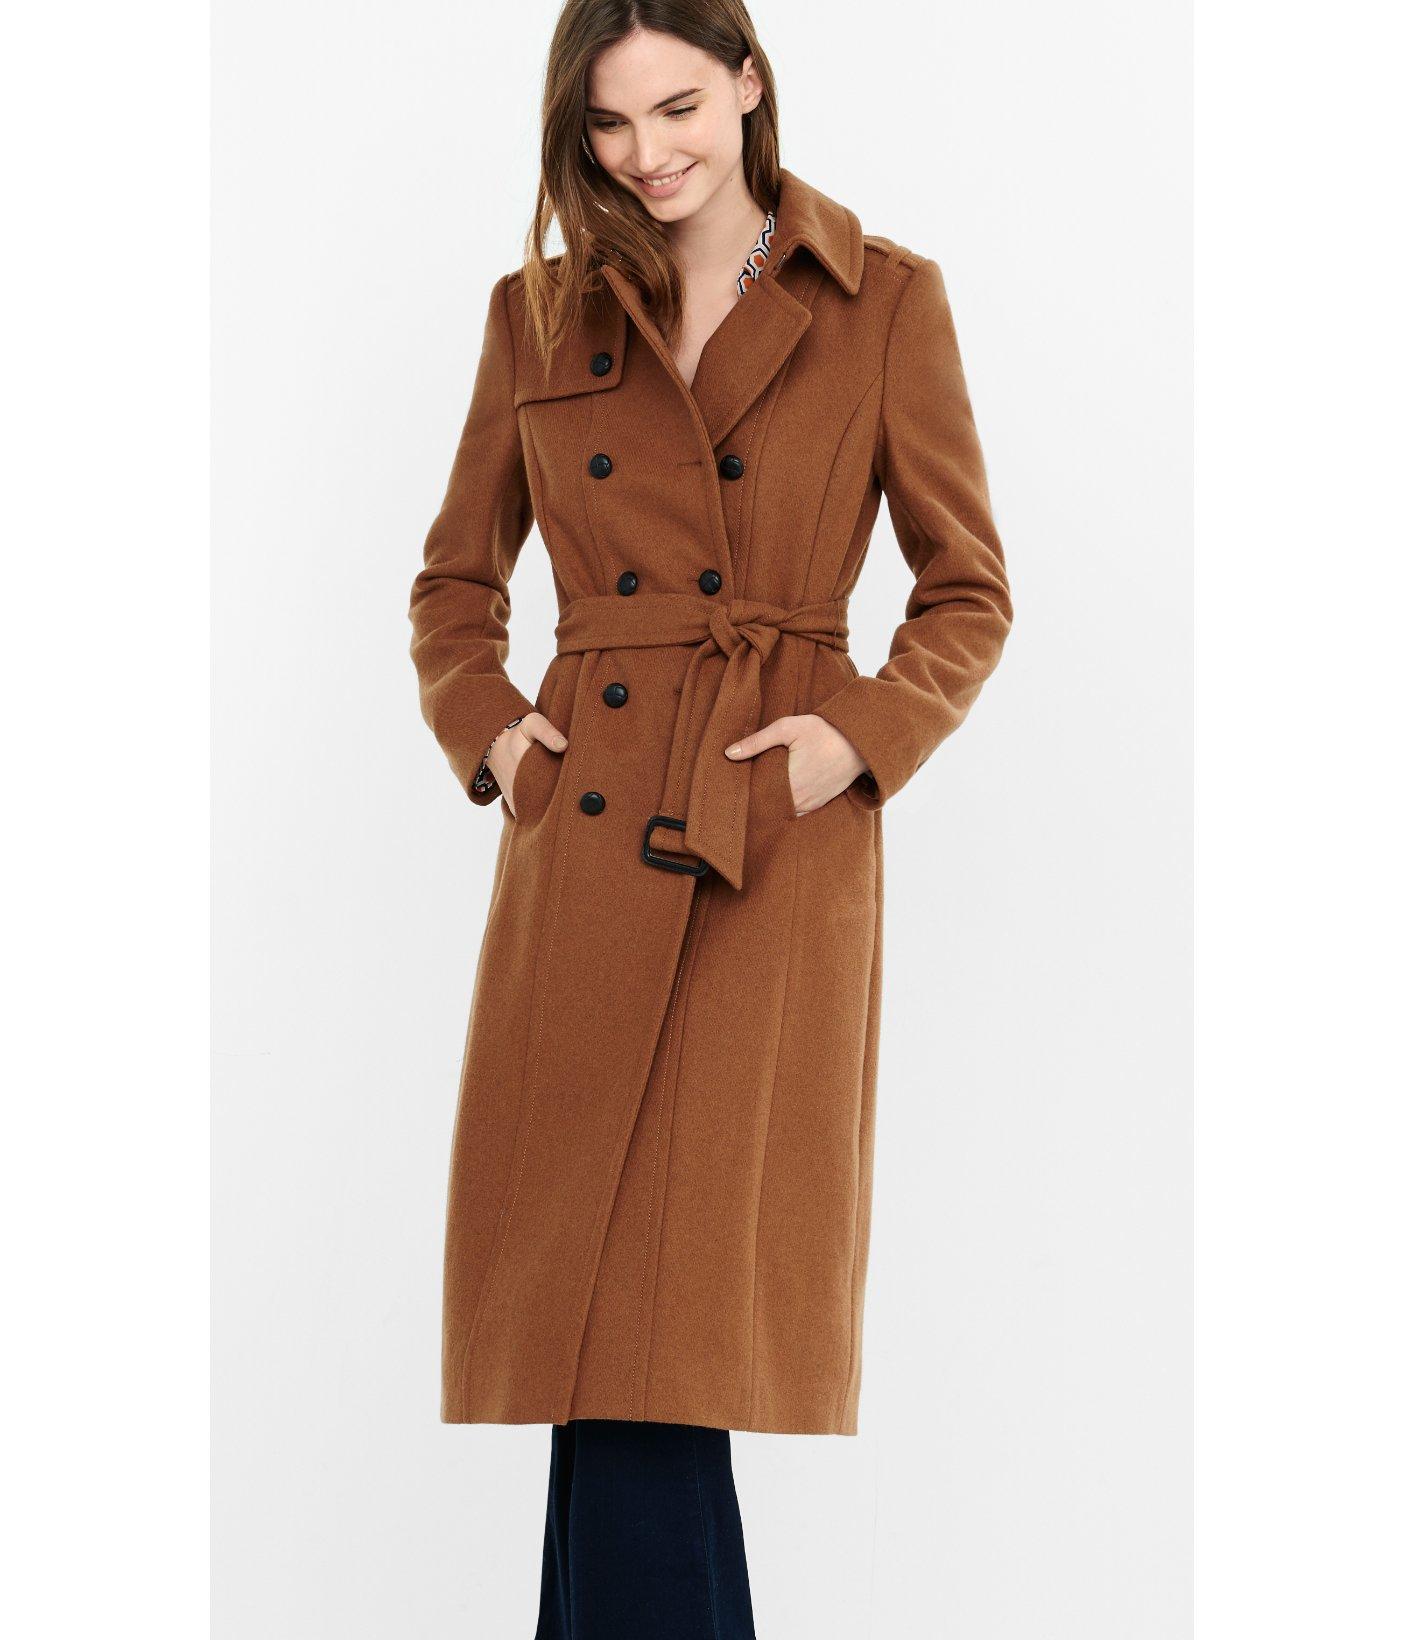 Long Wool Trench Coat | Down Coat